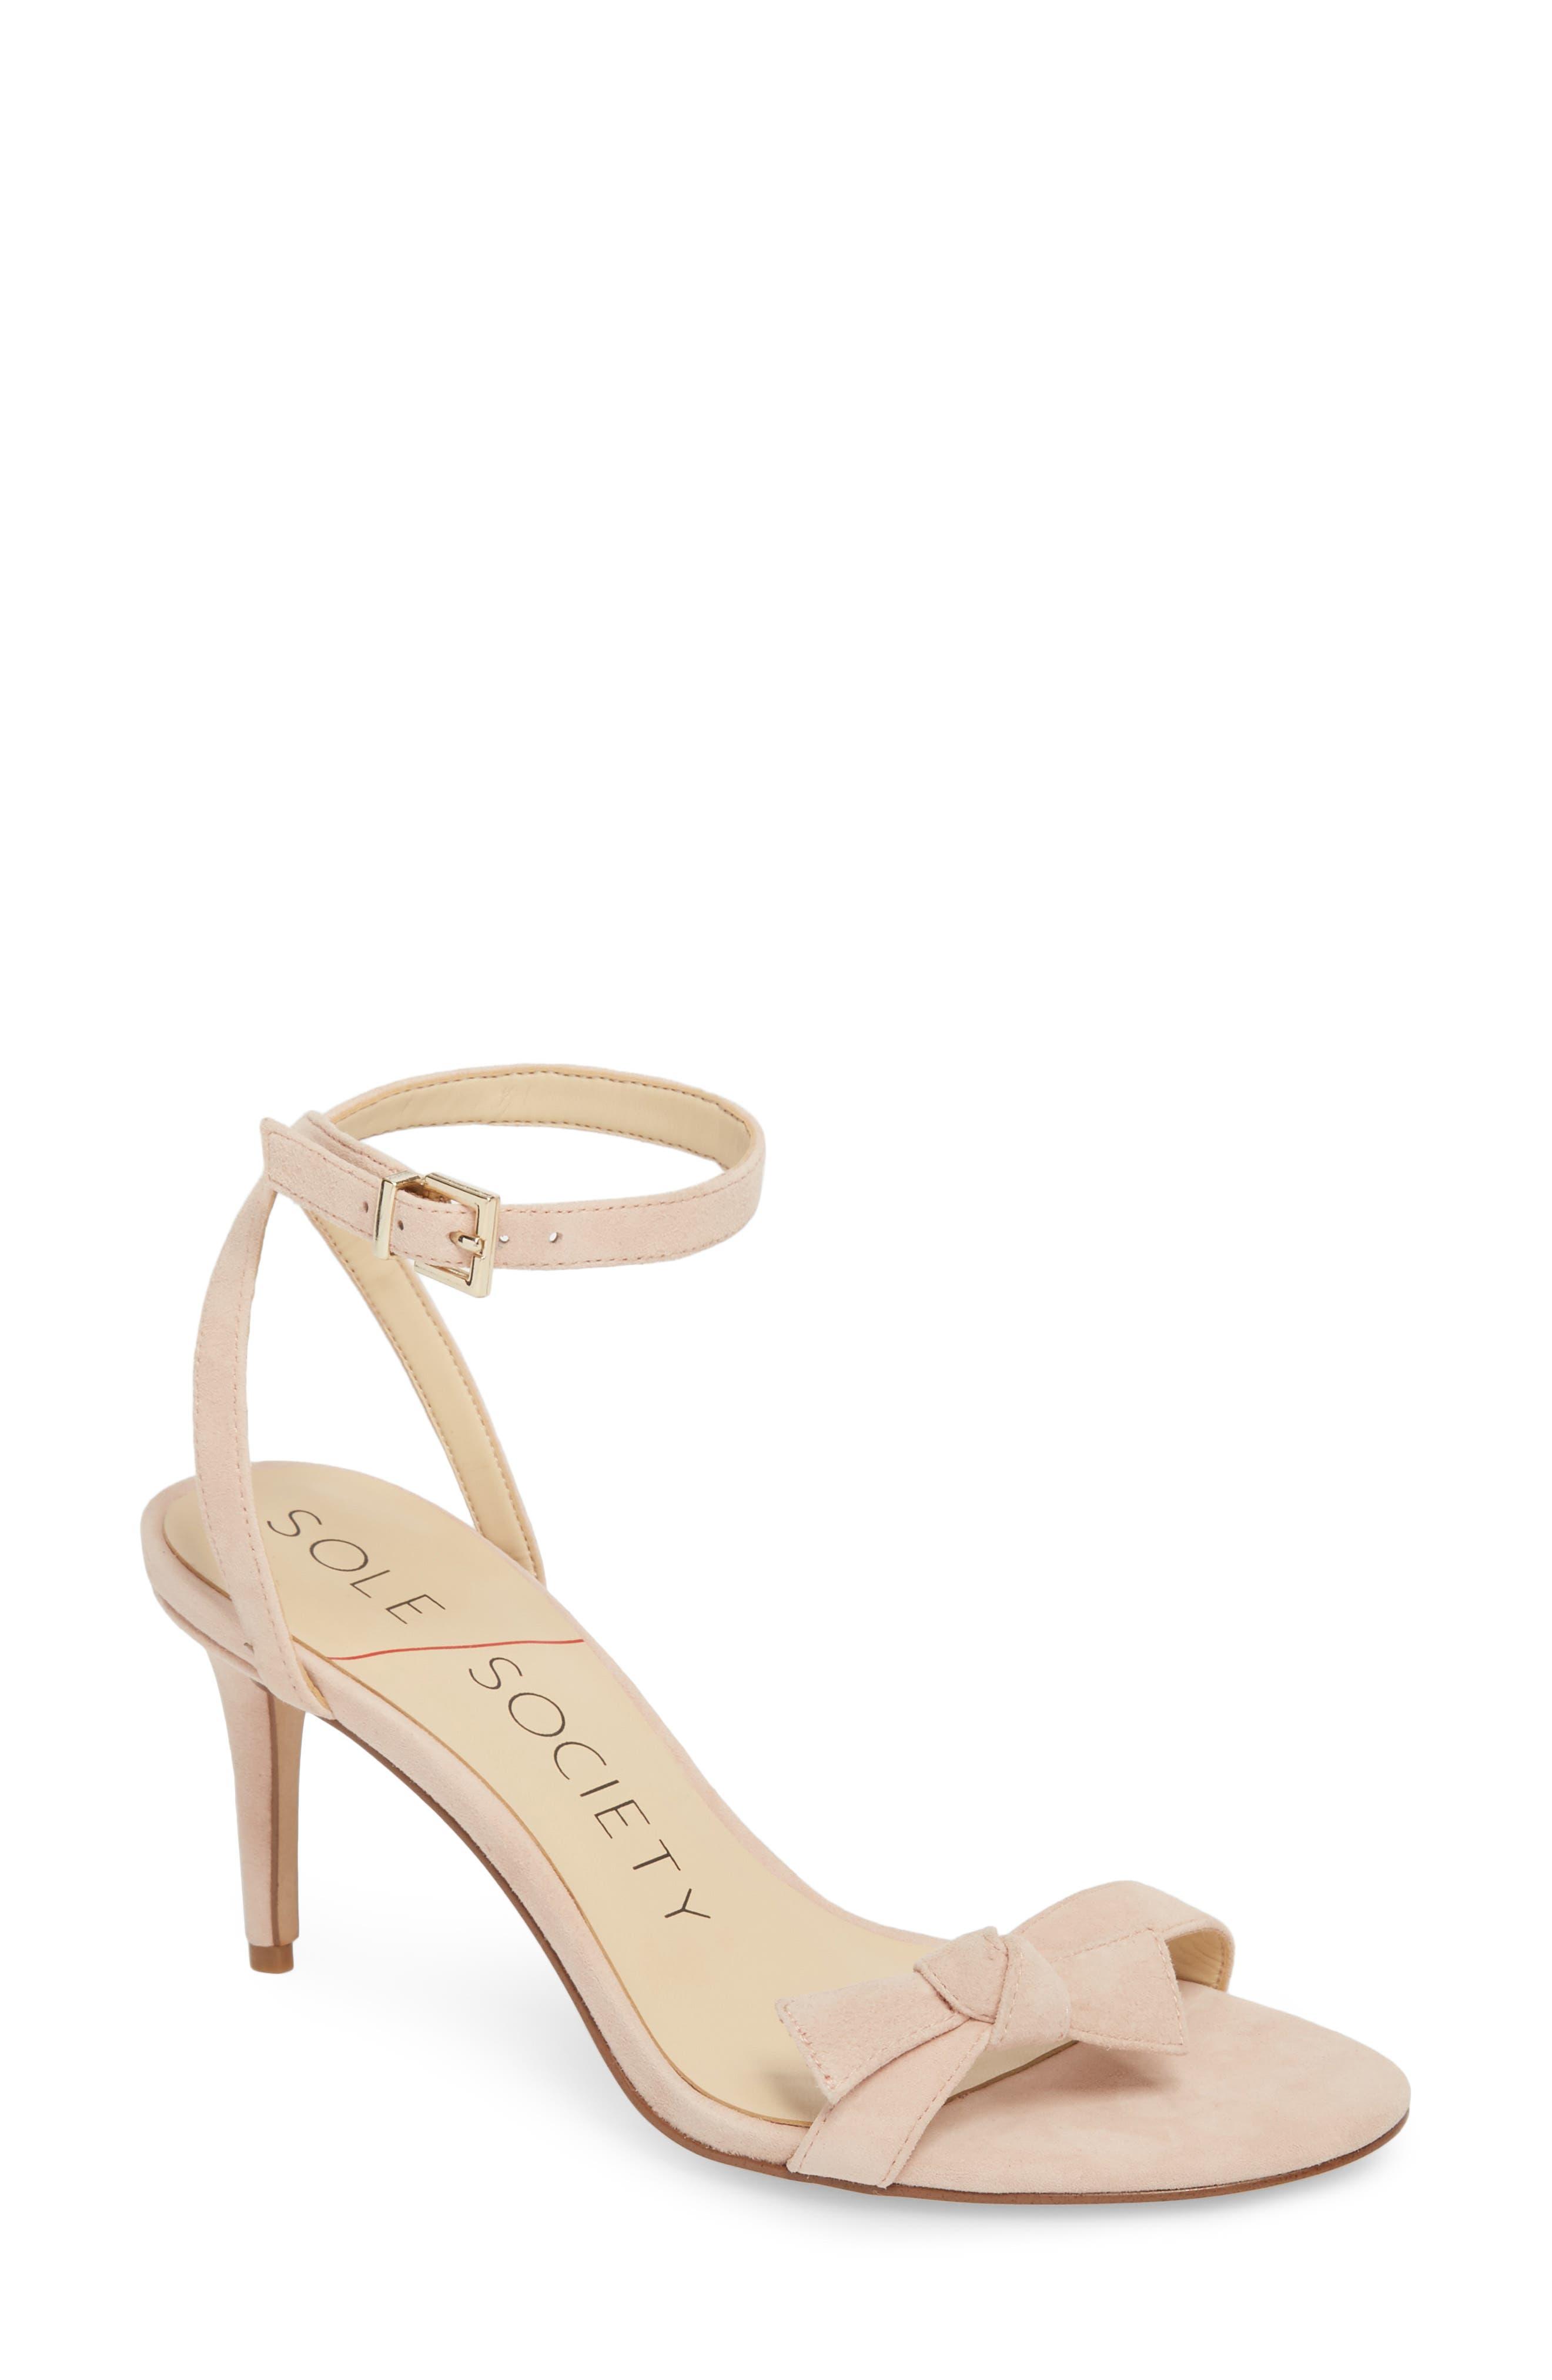 Avrilie Knotted Sandal,                         Main,                         color, BLUSH